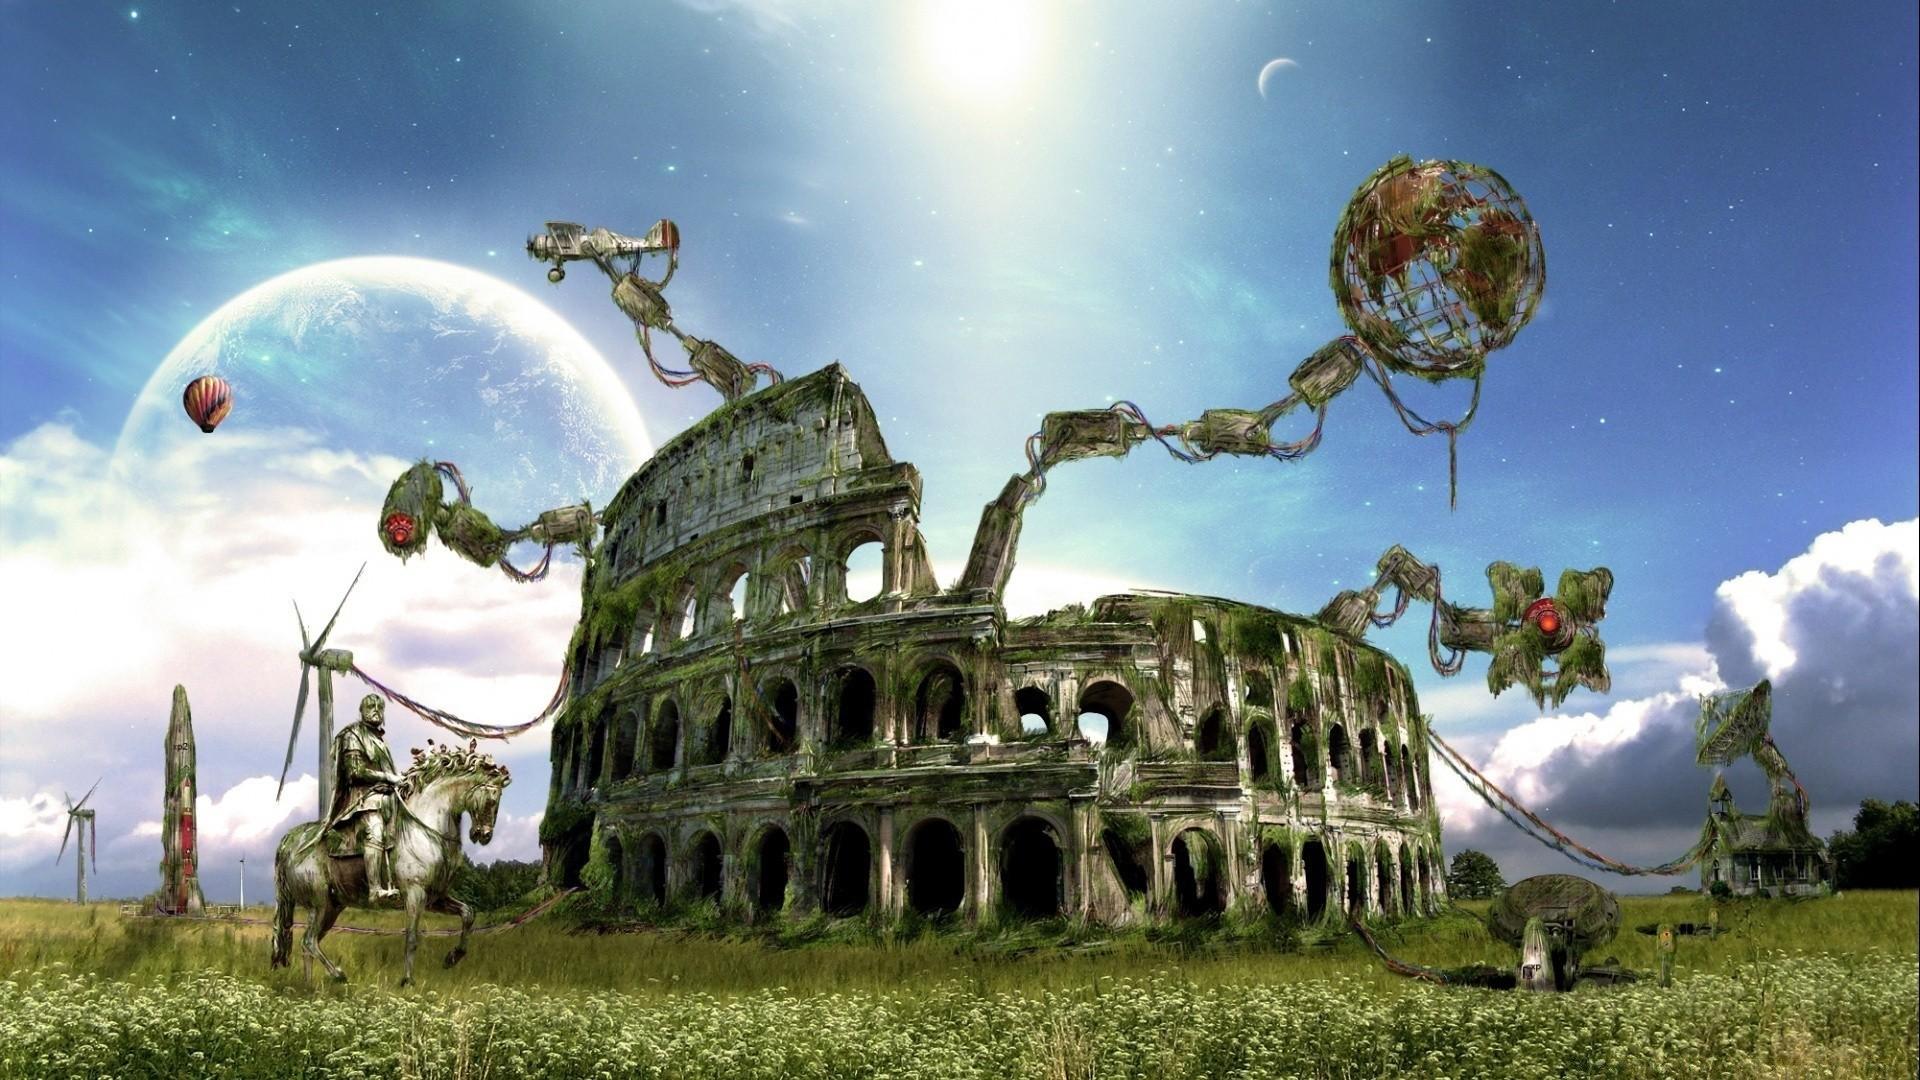 Surreal Wallpaper Free Download